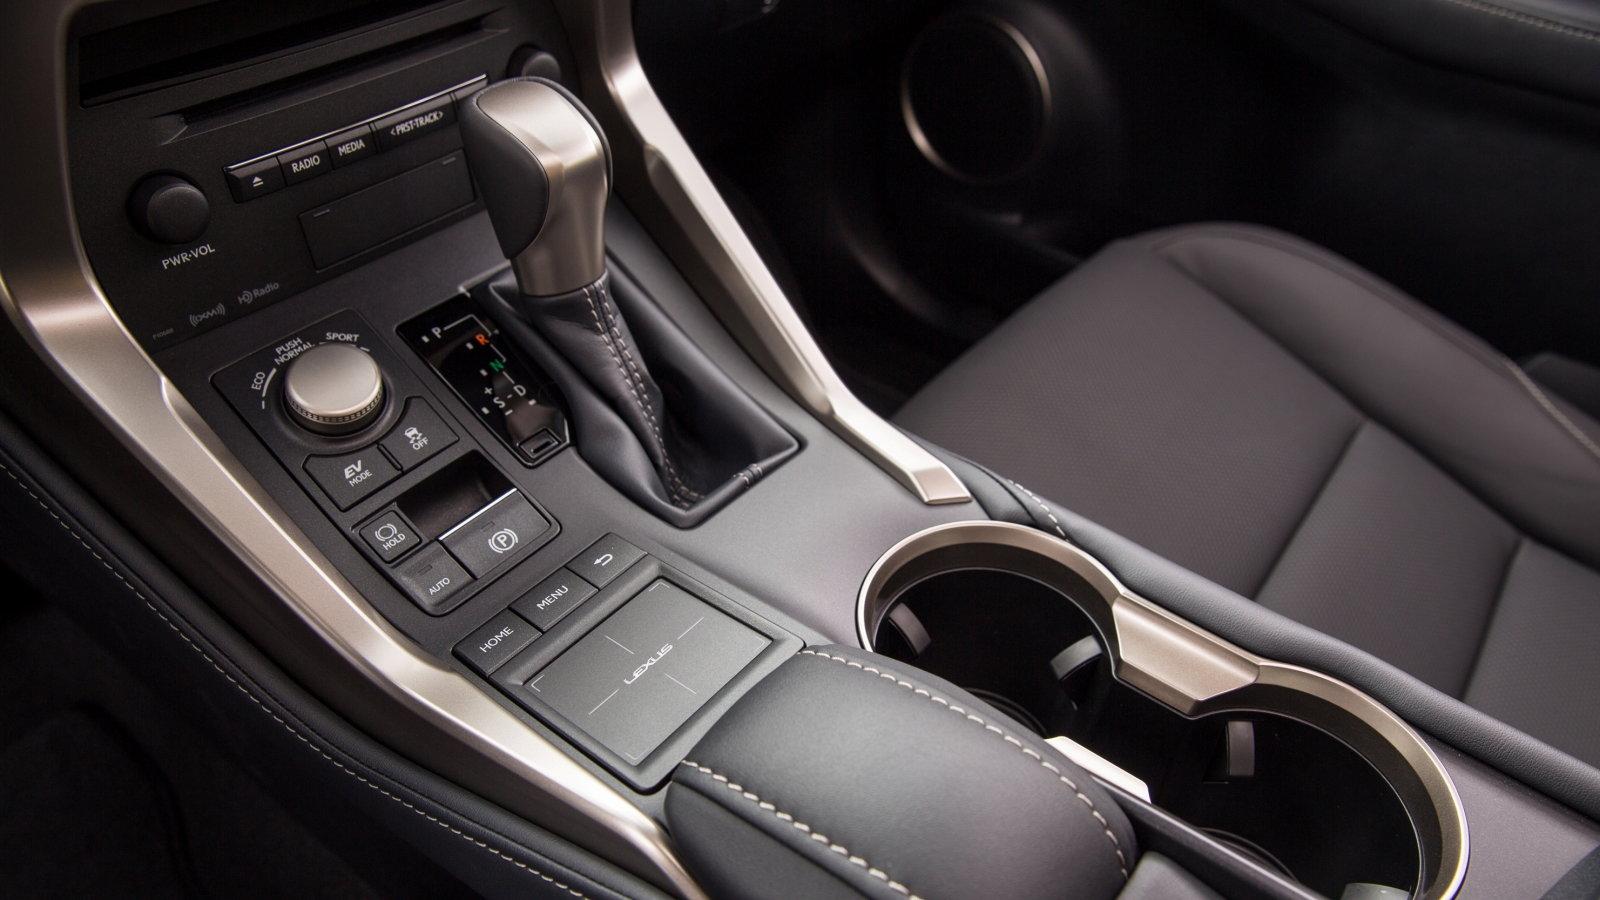 Lexus NX300h Hybrid Overview